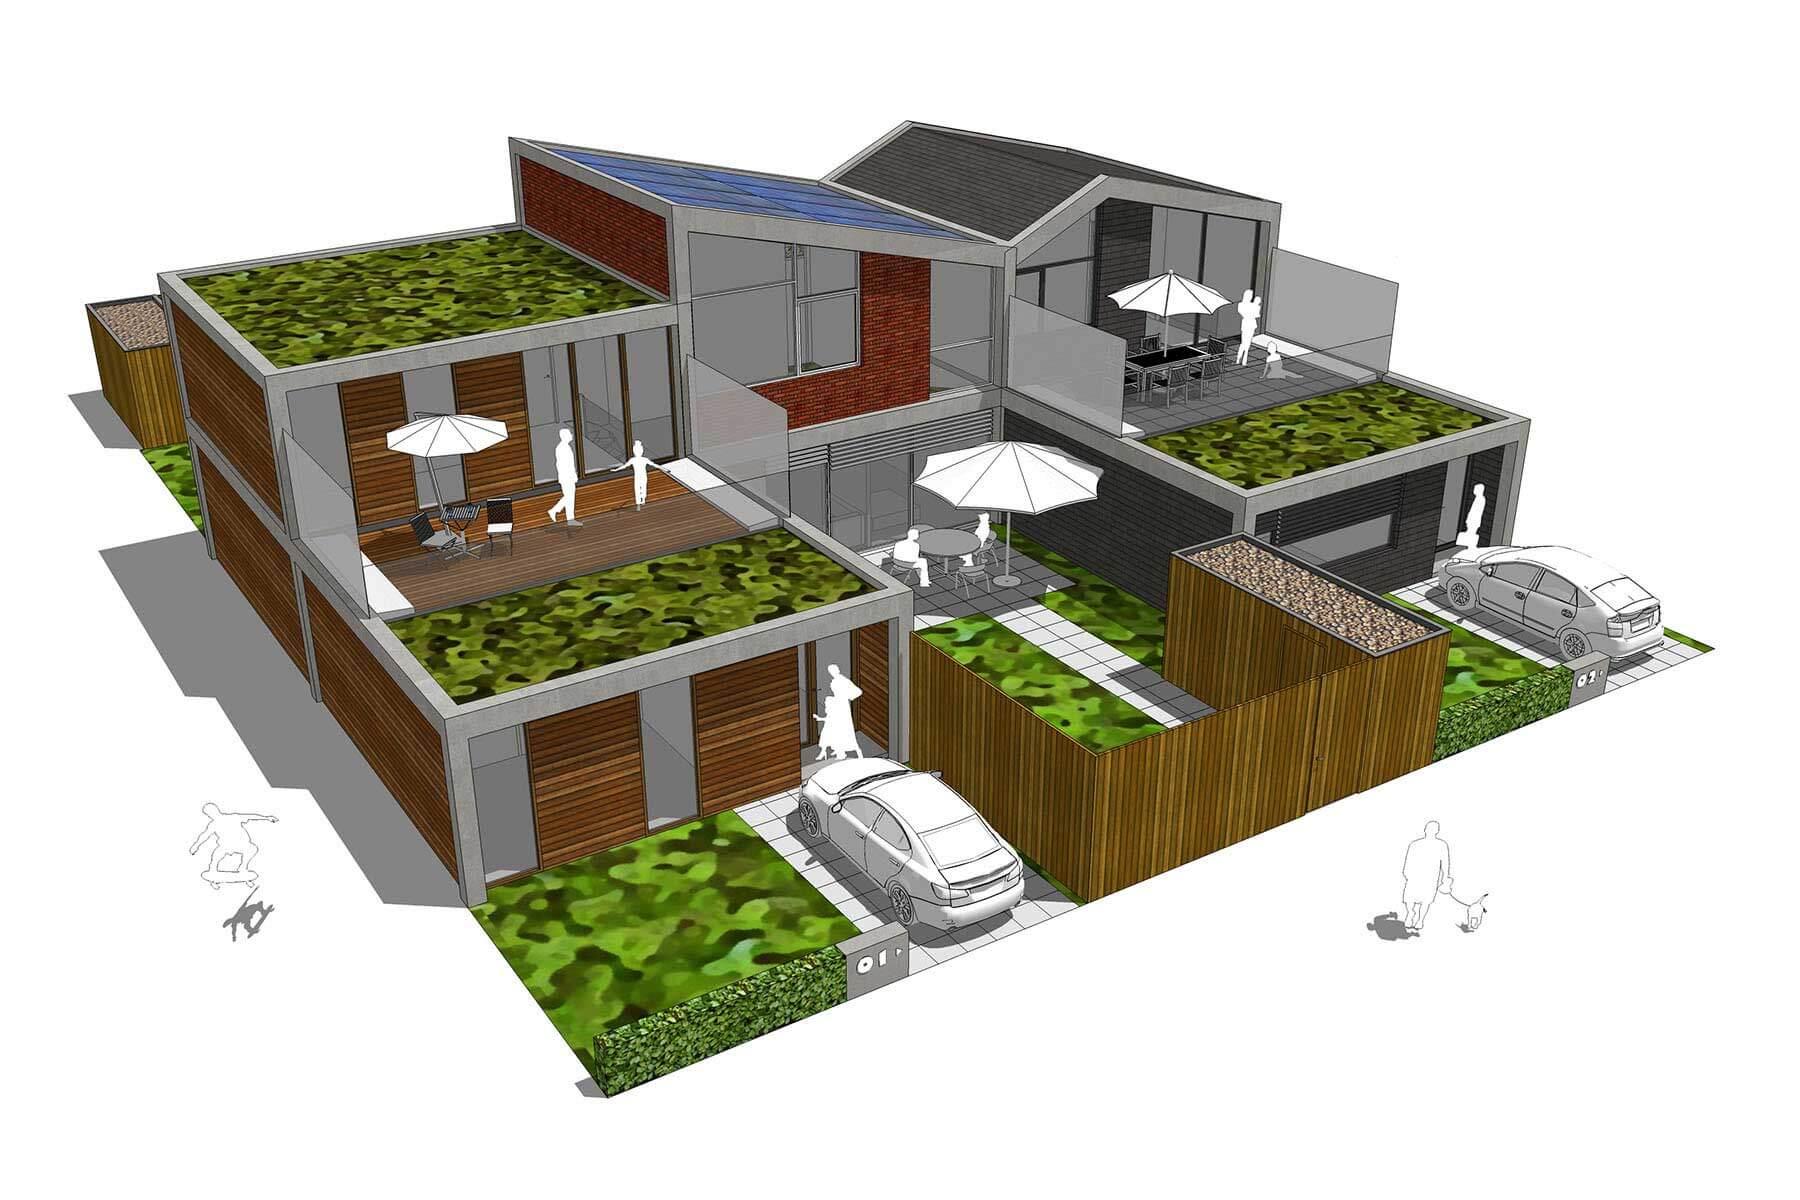 8A Architecten - Levensloopbestendige woningen, Schiedam